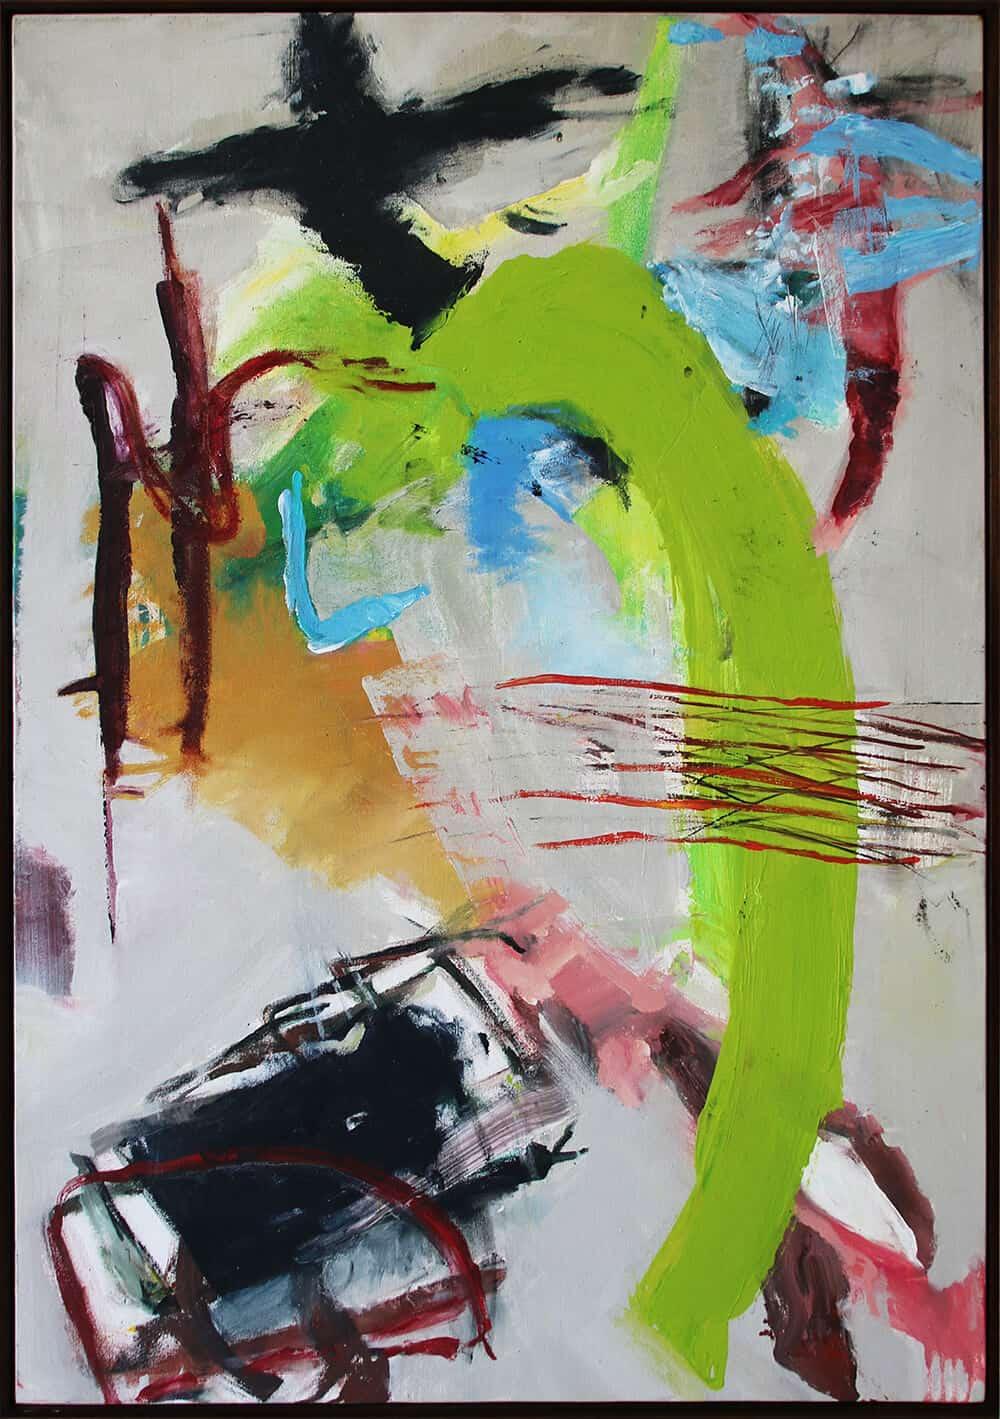 Karatara: Ambient Composition, 2019. Acryl auf Leinwand, 82.5 x 117.5 cm.